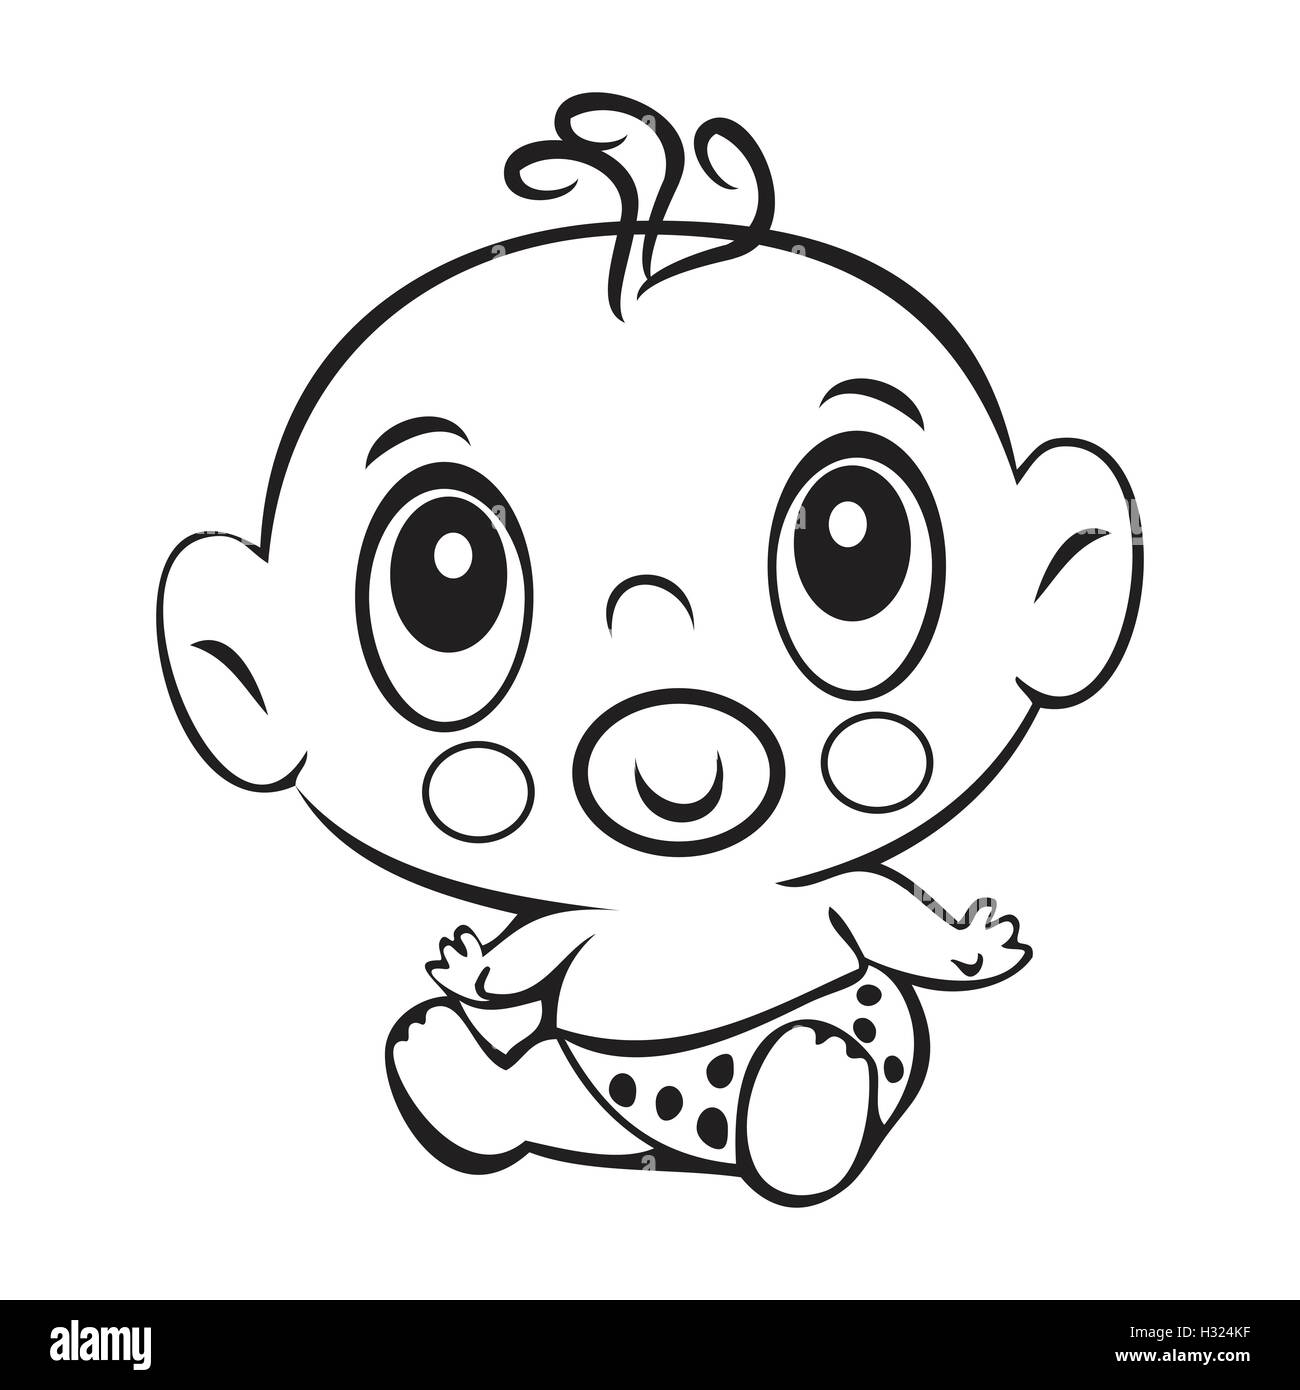 Coloriage Pour Bebe Garcon.Funny Baby Boy Mignon Bebe Garcon Dans Une Couche Isolee Pour Livre